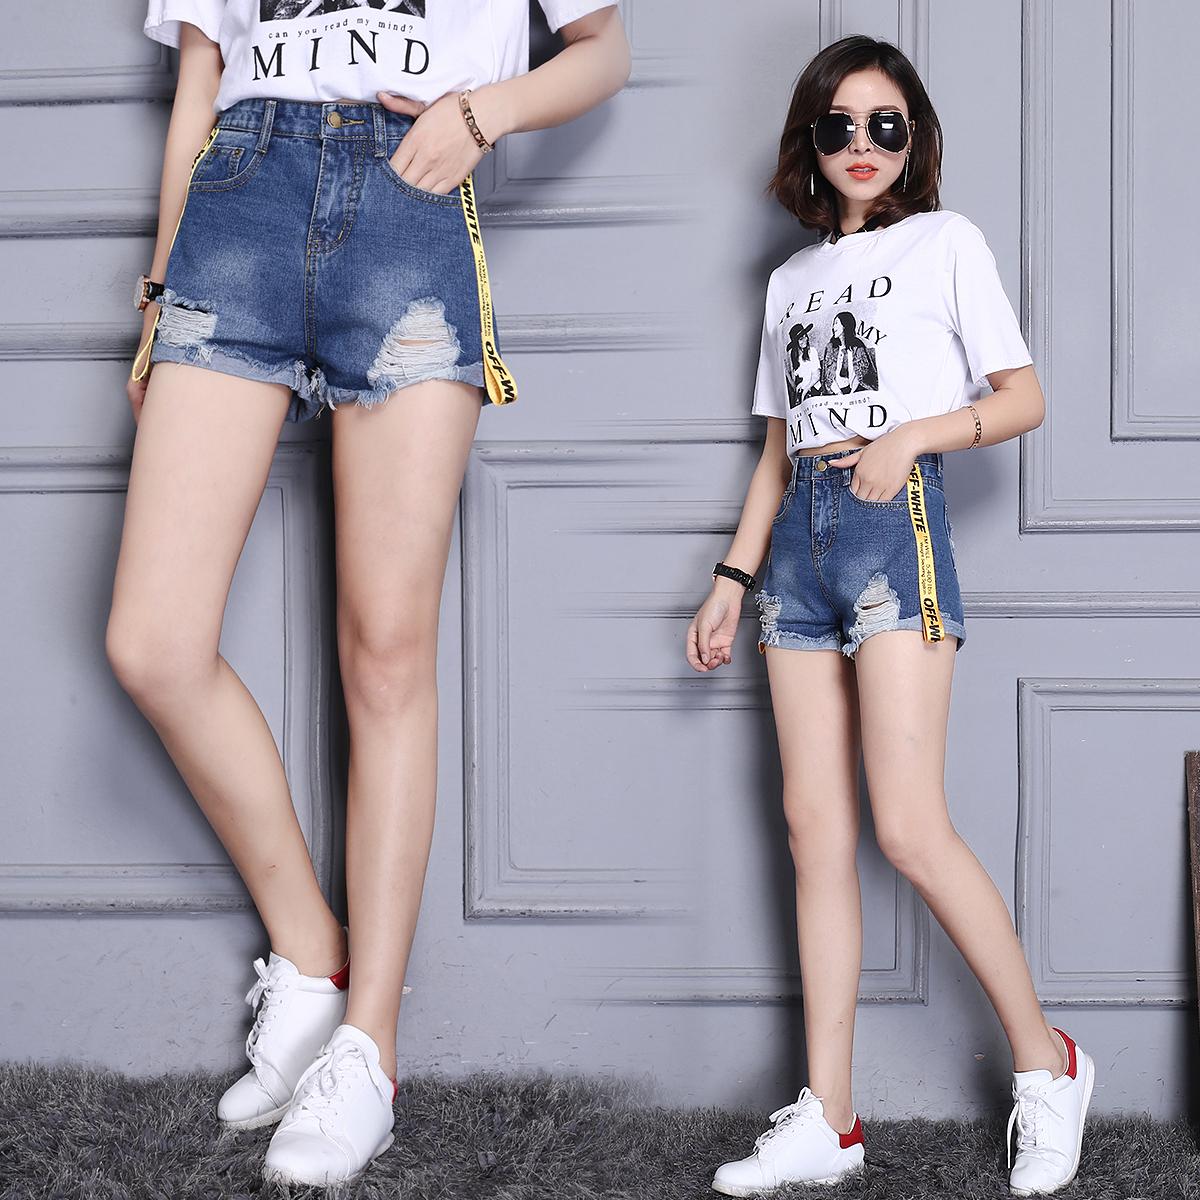 Versi Korea baru sisi warna flanging celana jeans celana jeans denim celana pendek (Biru tua